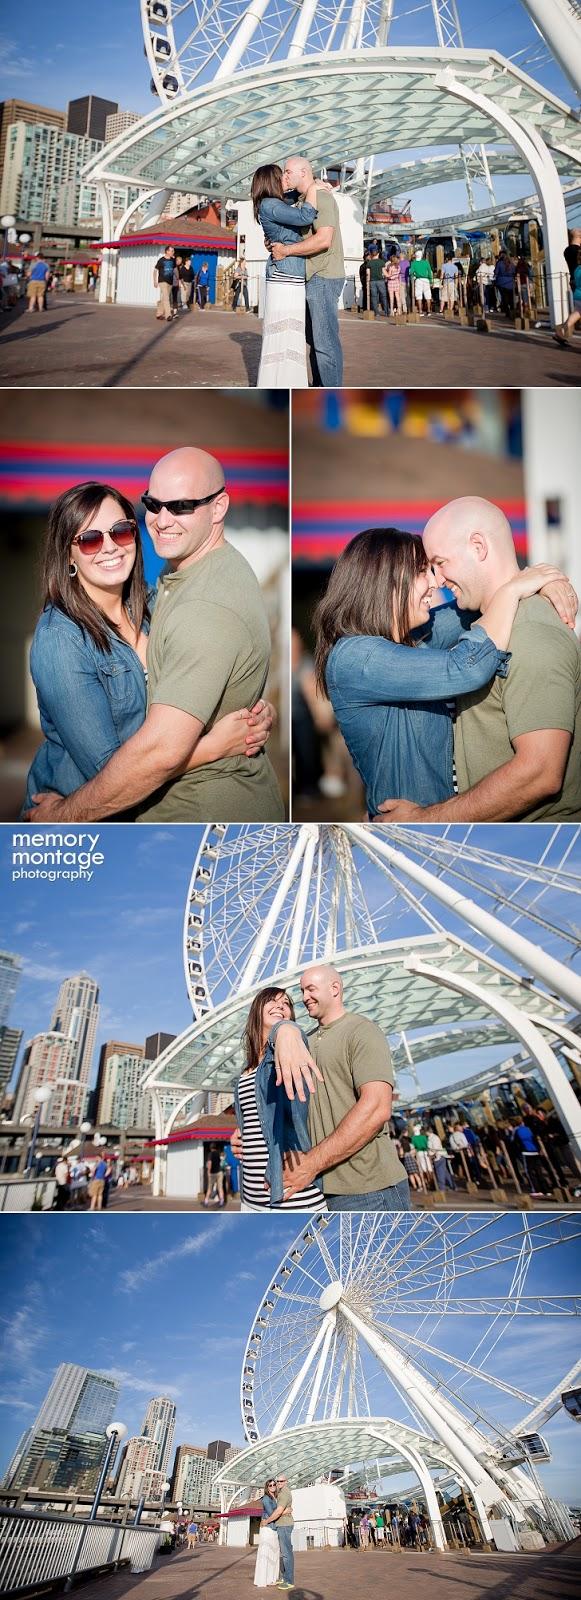 Seattle Proposal, Seattle Great Wheel Proposal, Seattle Waterfront Proposal, Proposal Photography, Seattle Photographers, Seattle Wedding Photographers, Memory Montage Photography - 01